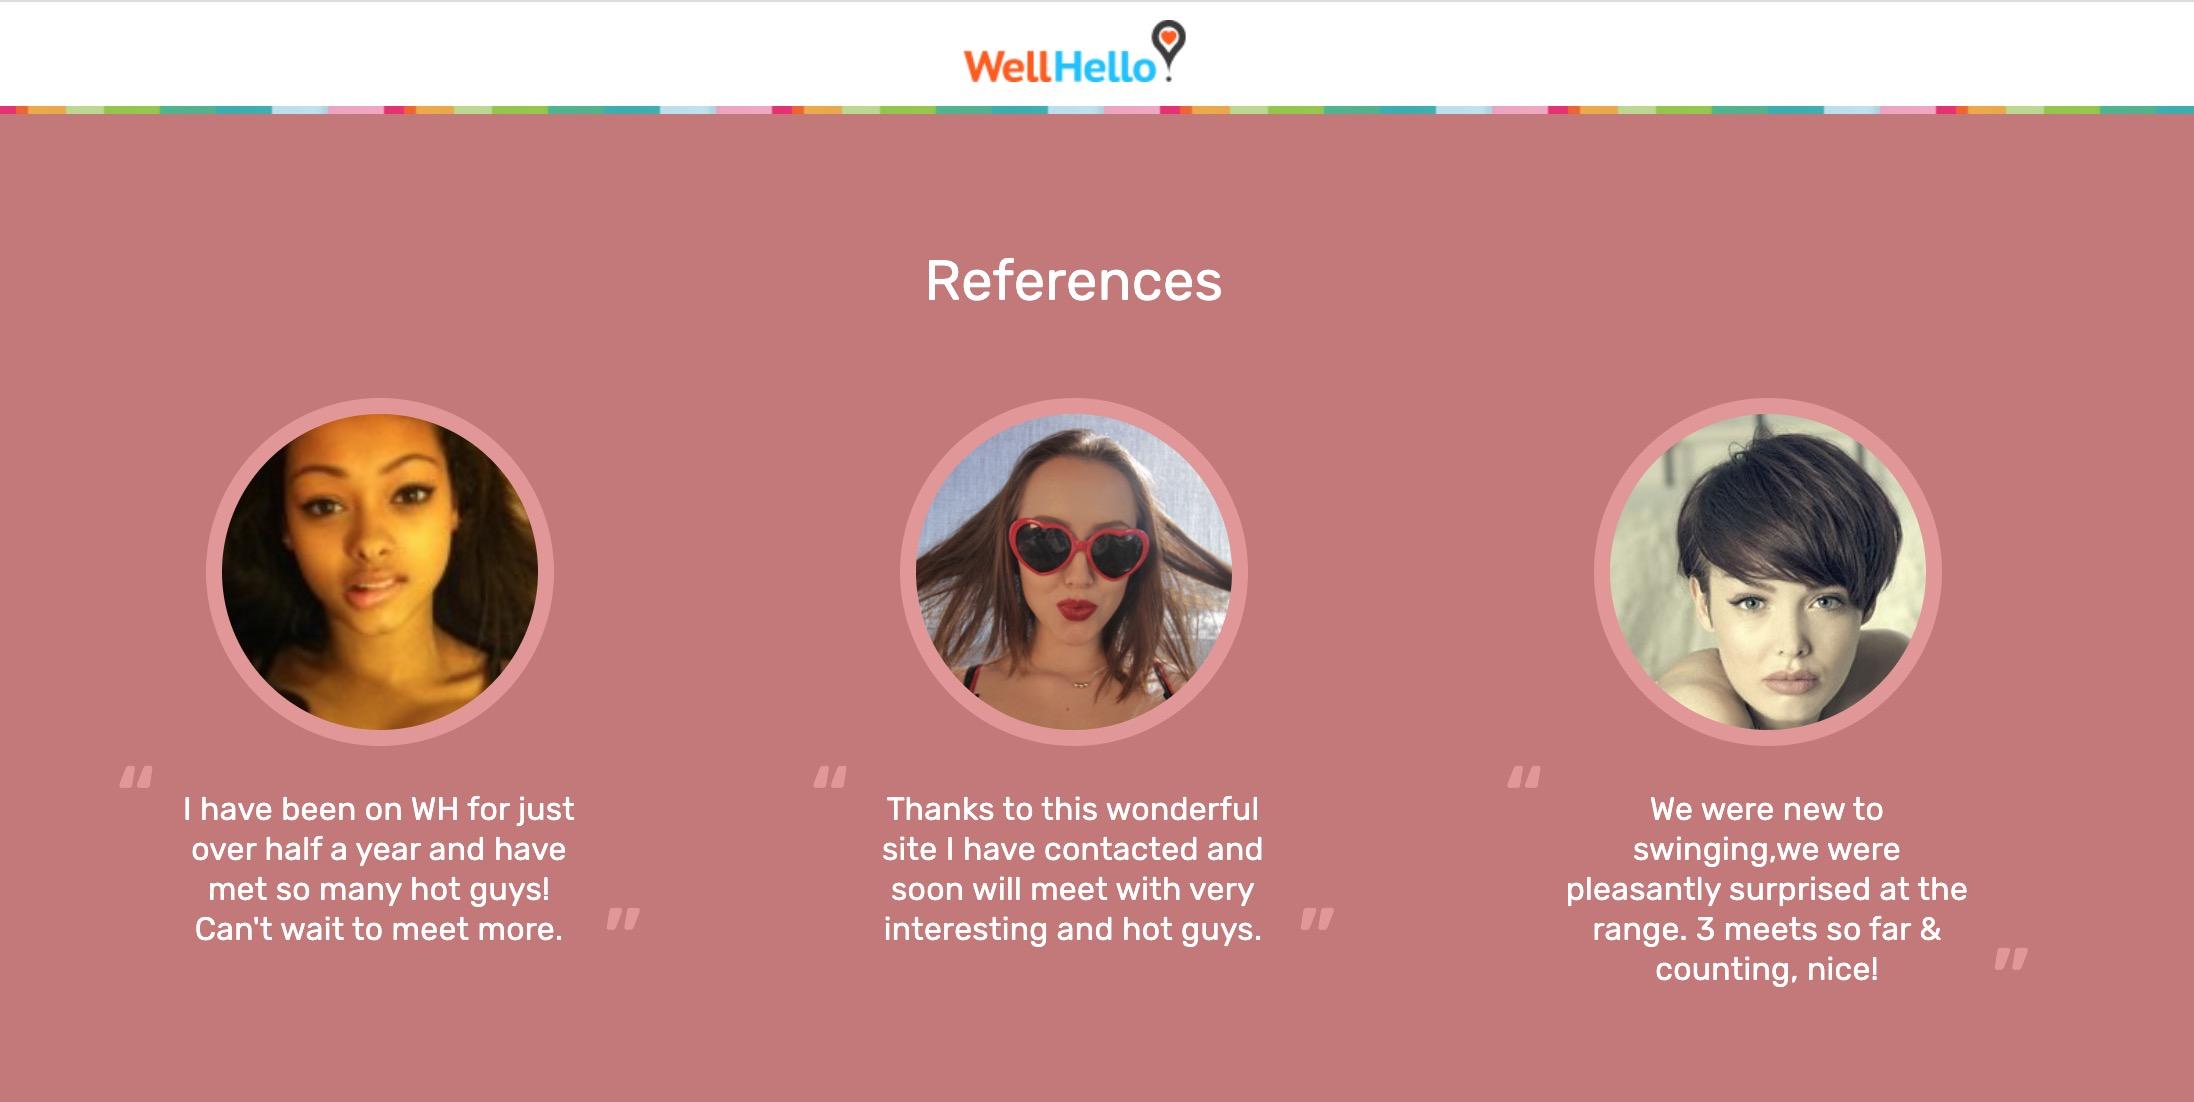 Wellhello references